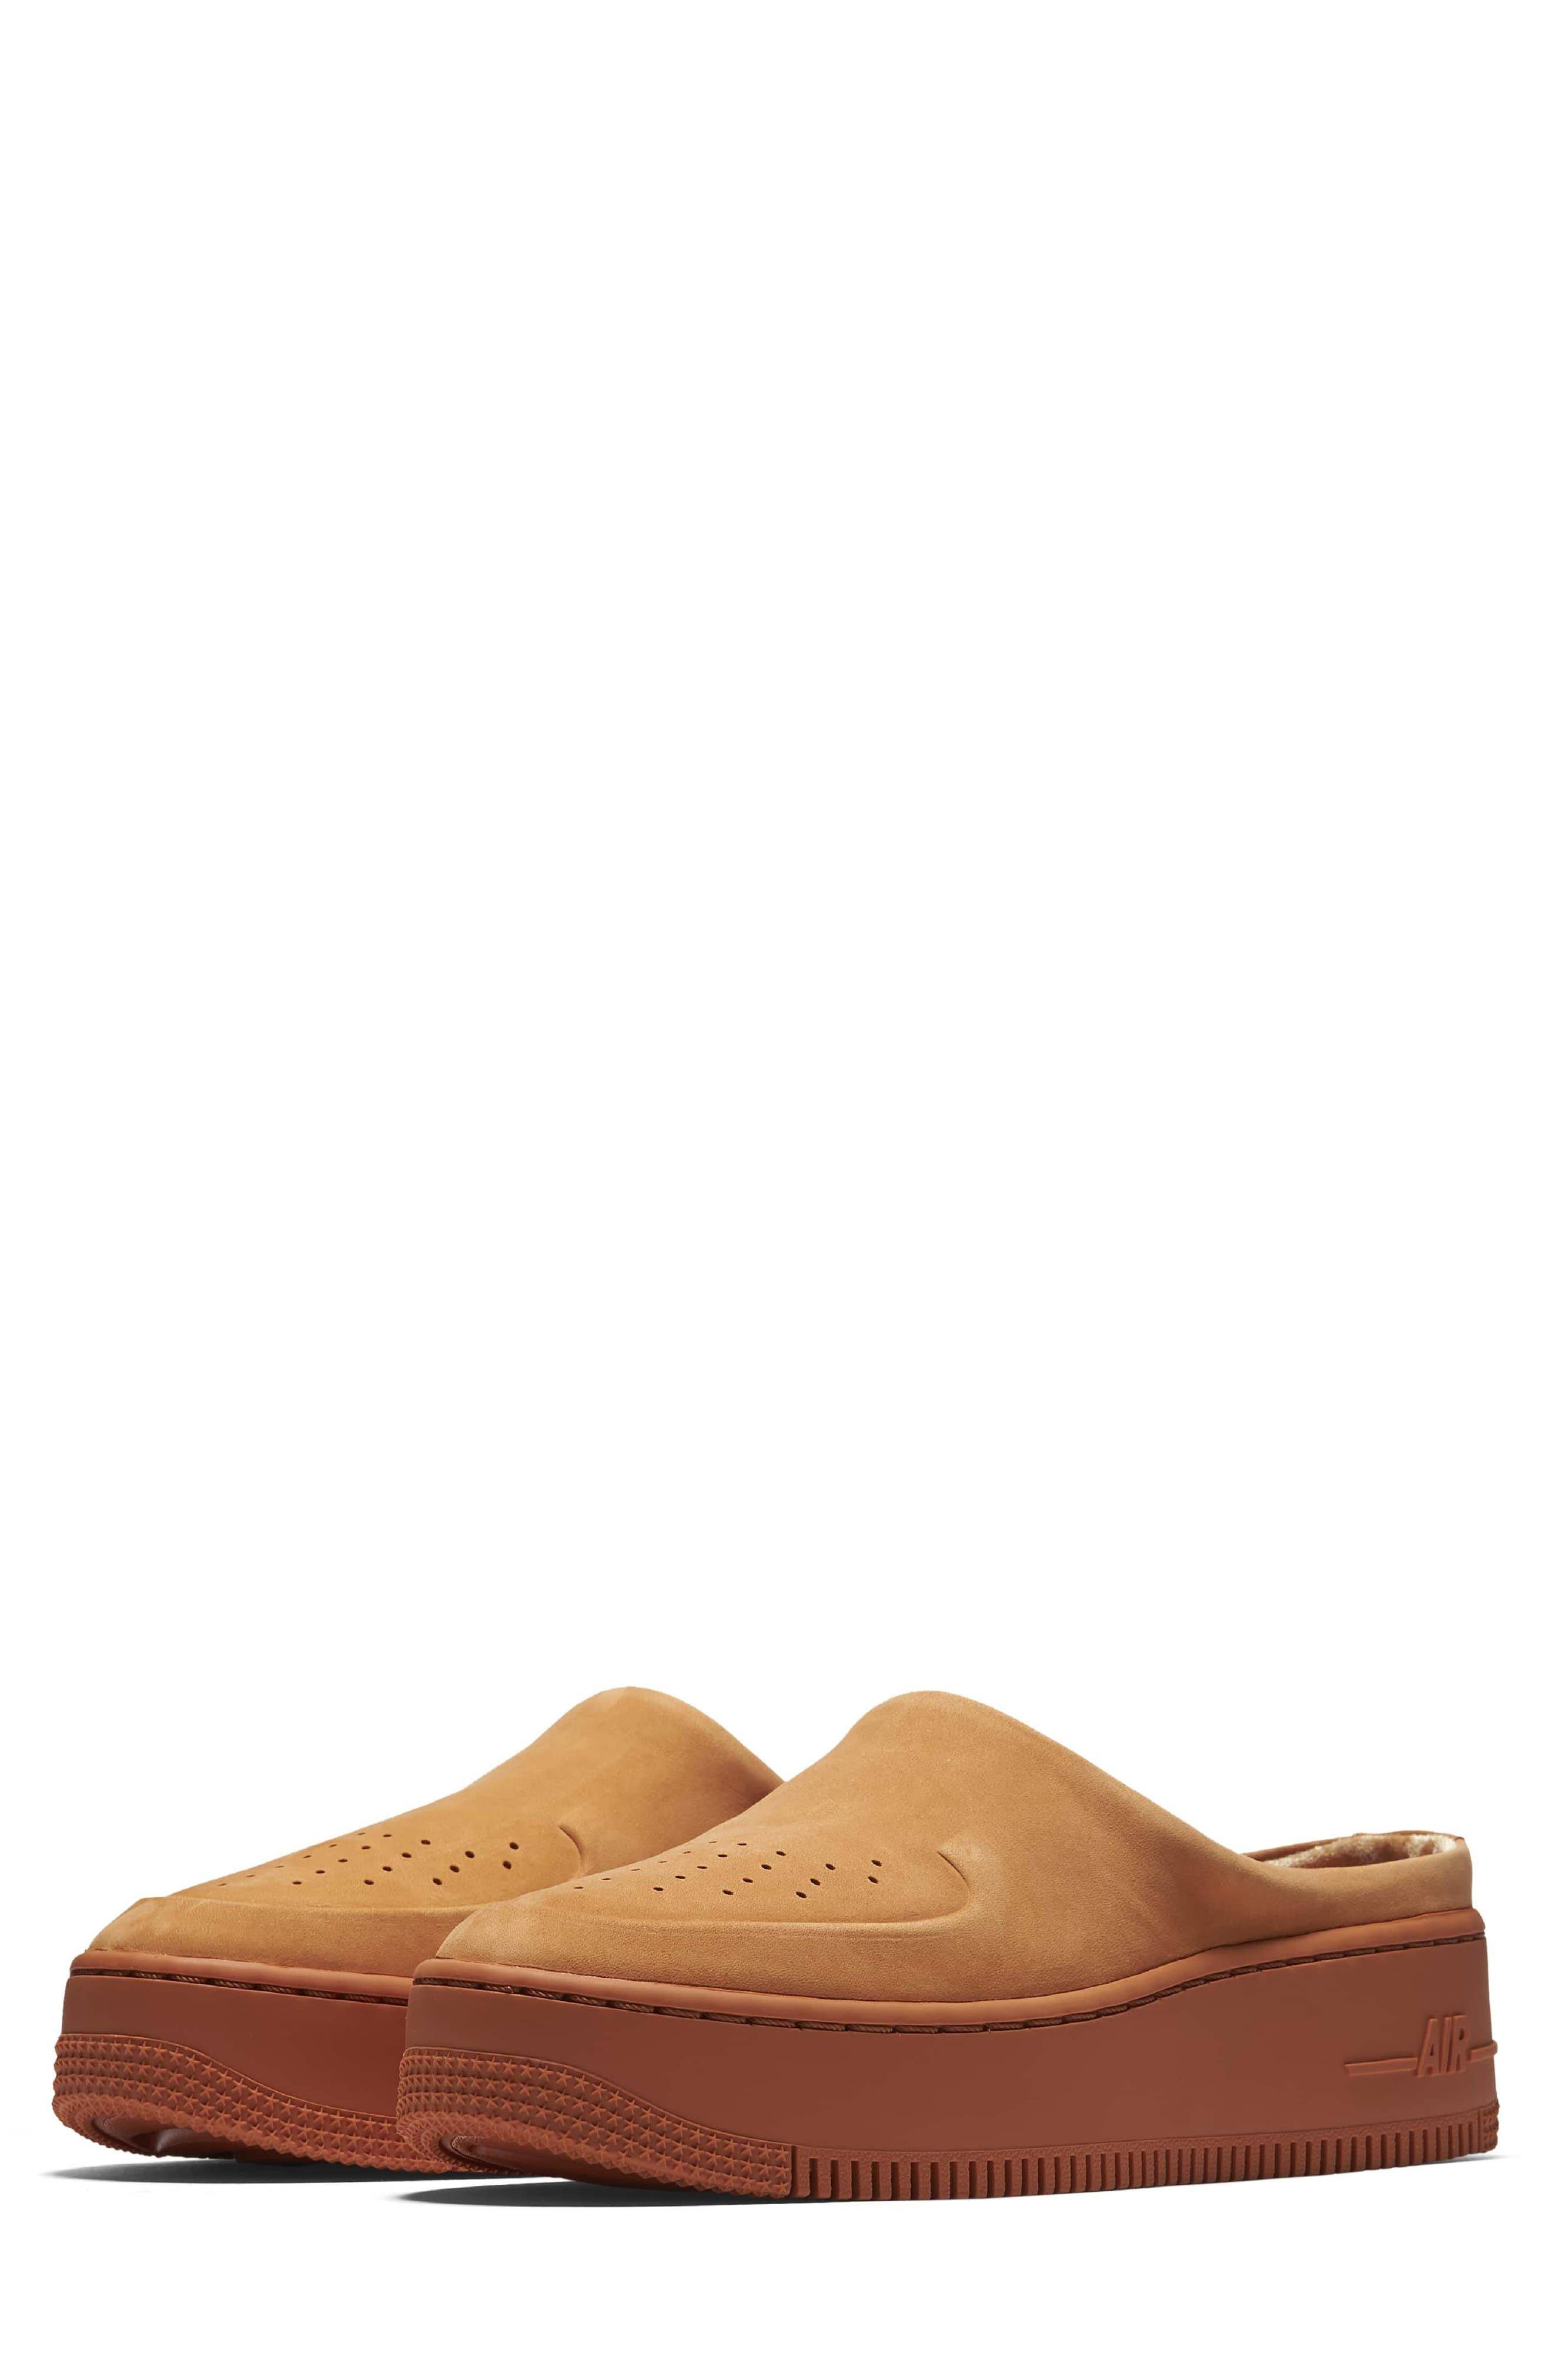 Air Force 1 Lover XX Slip-On Mule Sneaker,                             Main thumbnail 2, color,